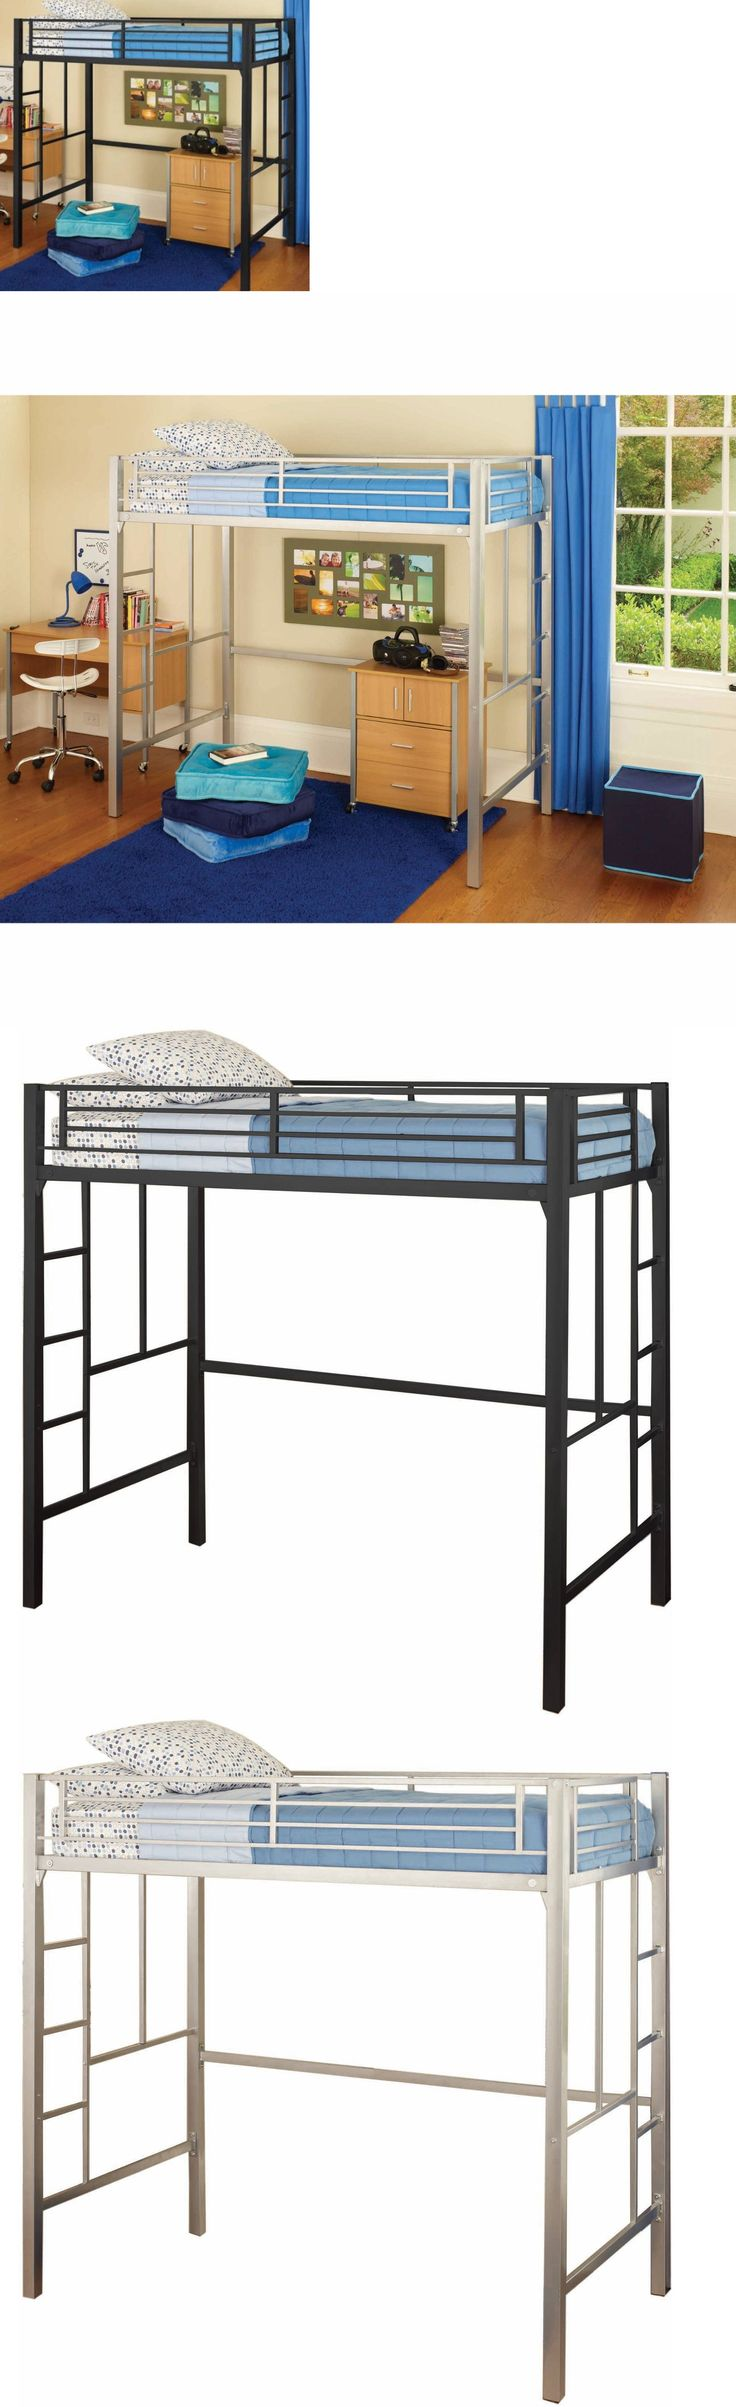 University loft graduate series twin xl open loft bed natural finish - Kids Furniture Twin Metal Loft Bed Two Ladders Kids Bedroom Furniture Bunk Frame Safe Dorm